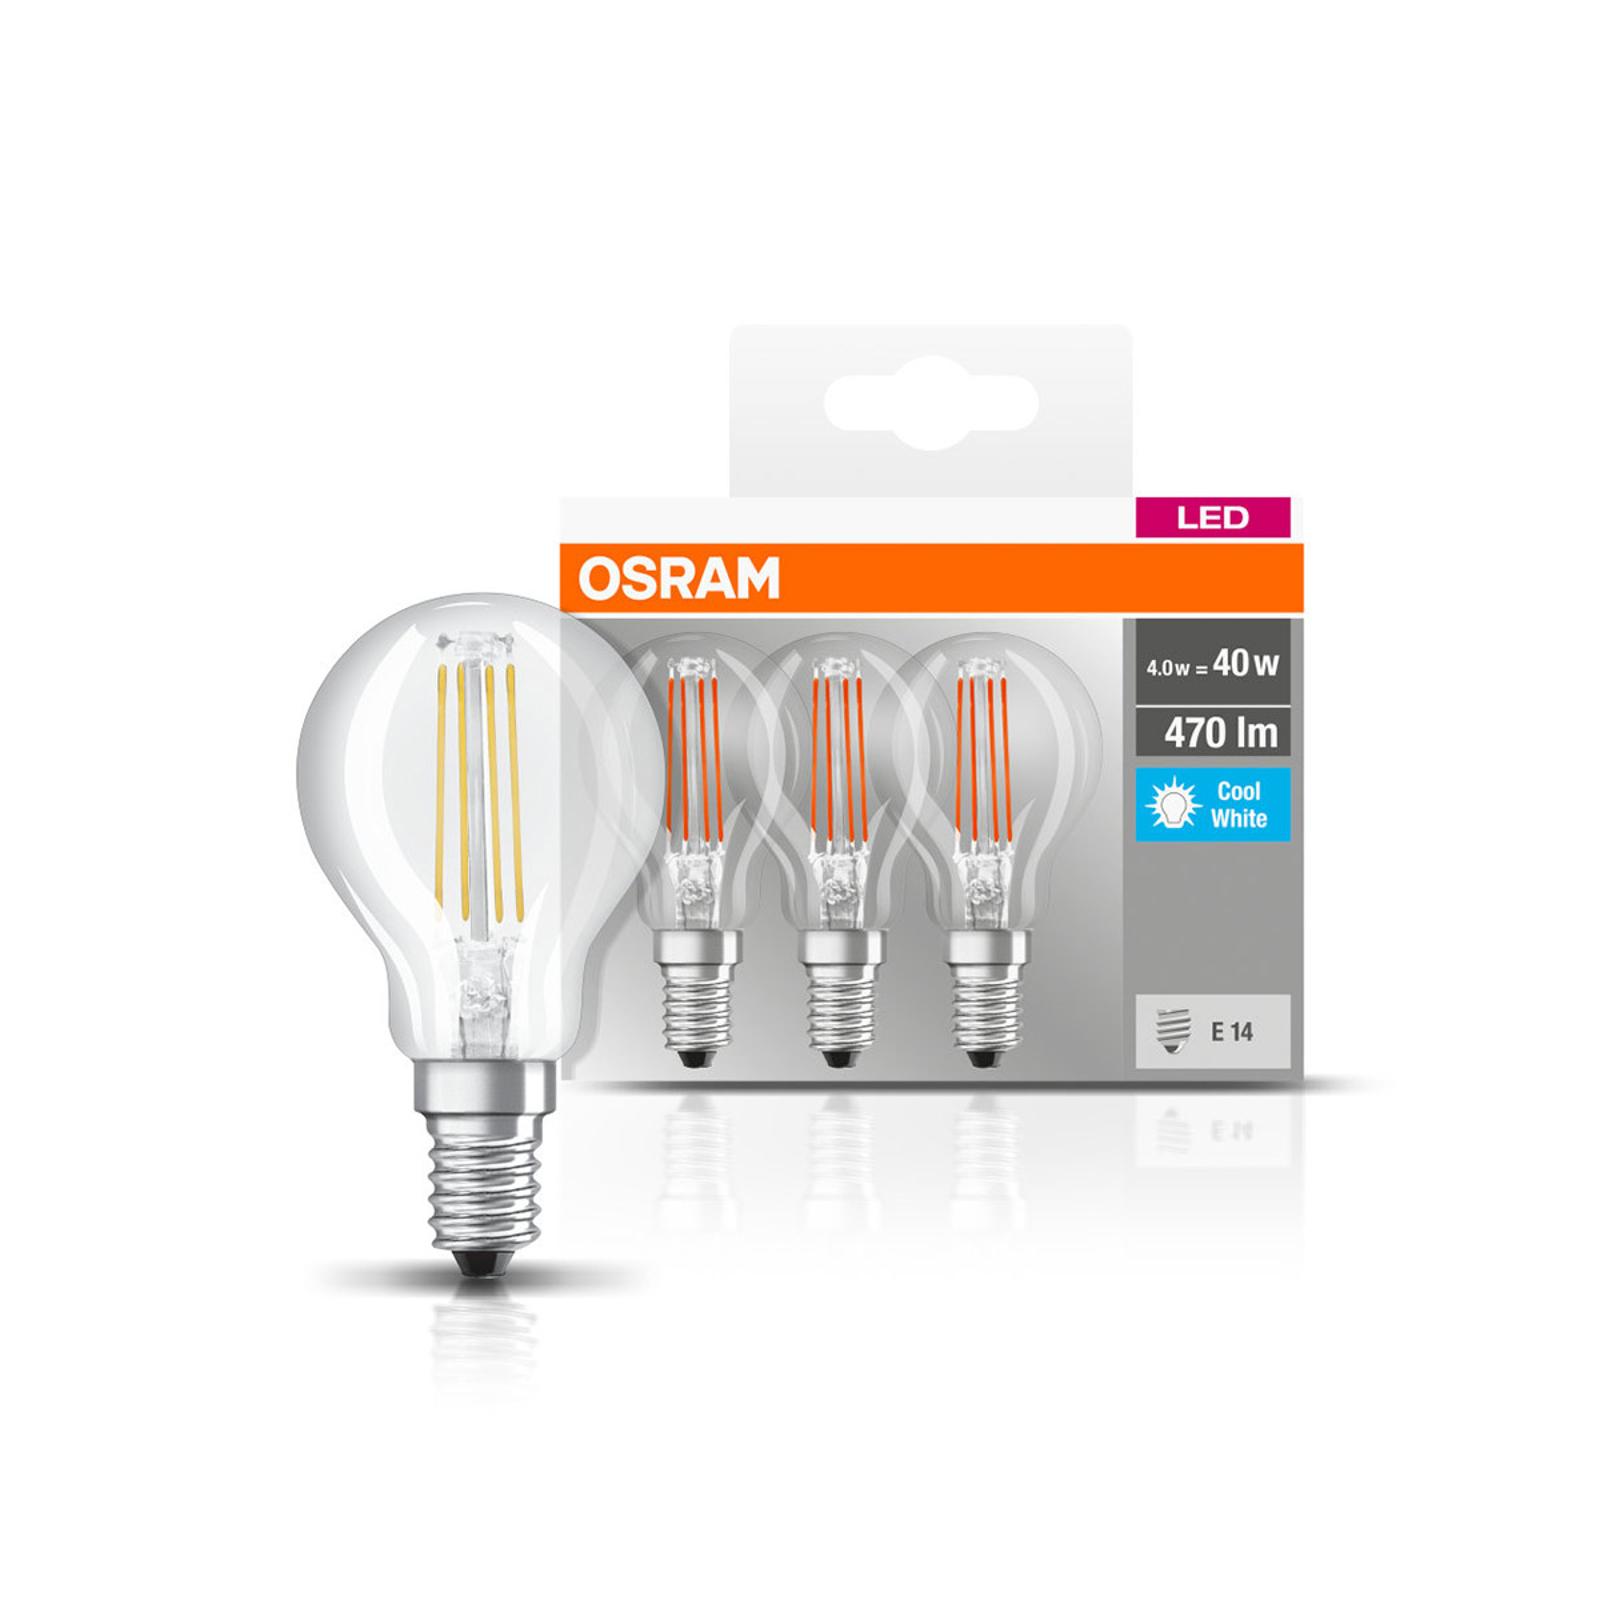 OSRAM LED-Lampe E14 P40 4W Filament 840 470lm 3er